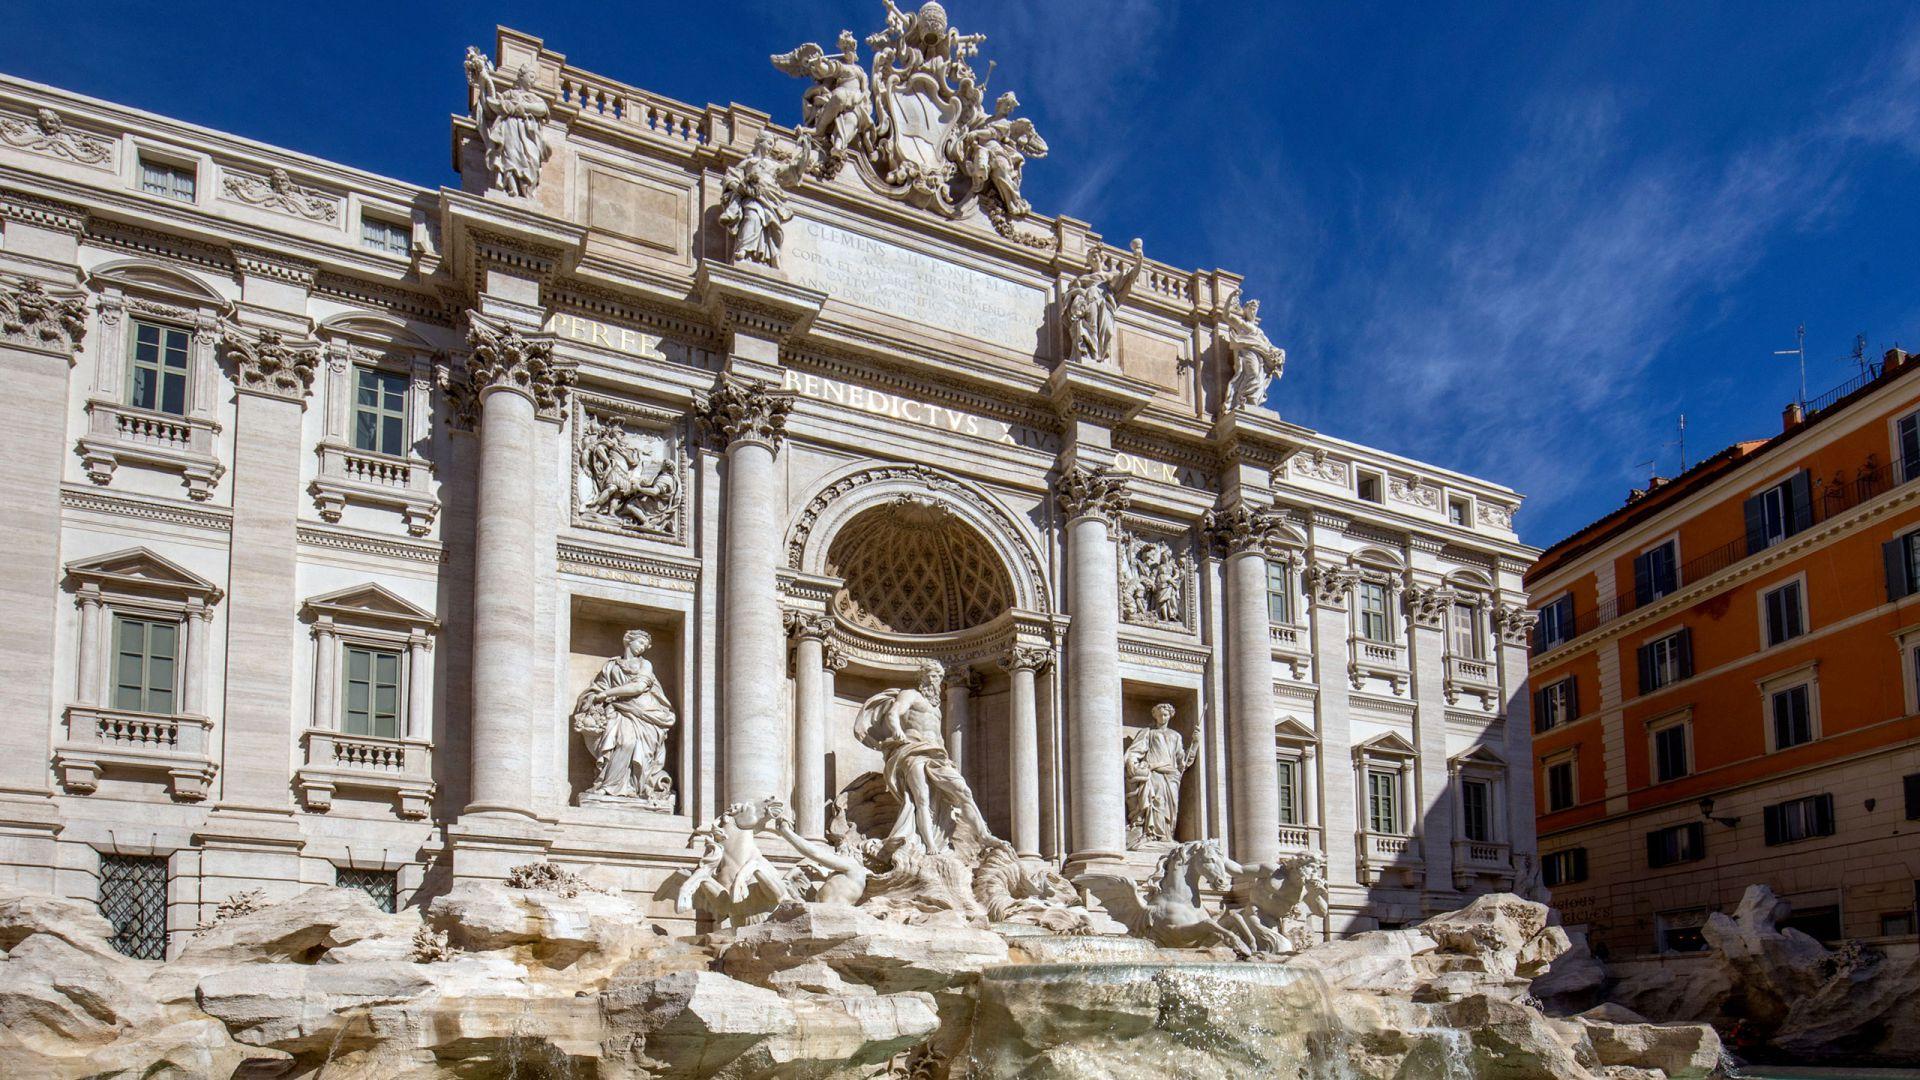 albergo-ottocento-rome-monuments-04